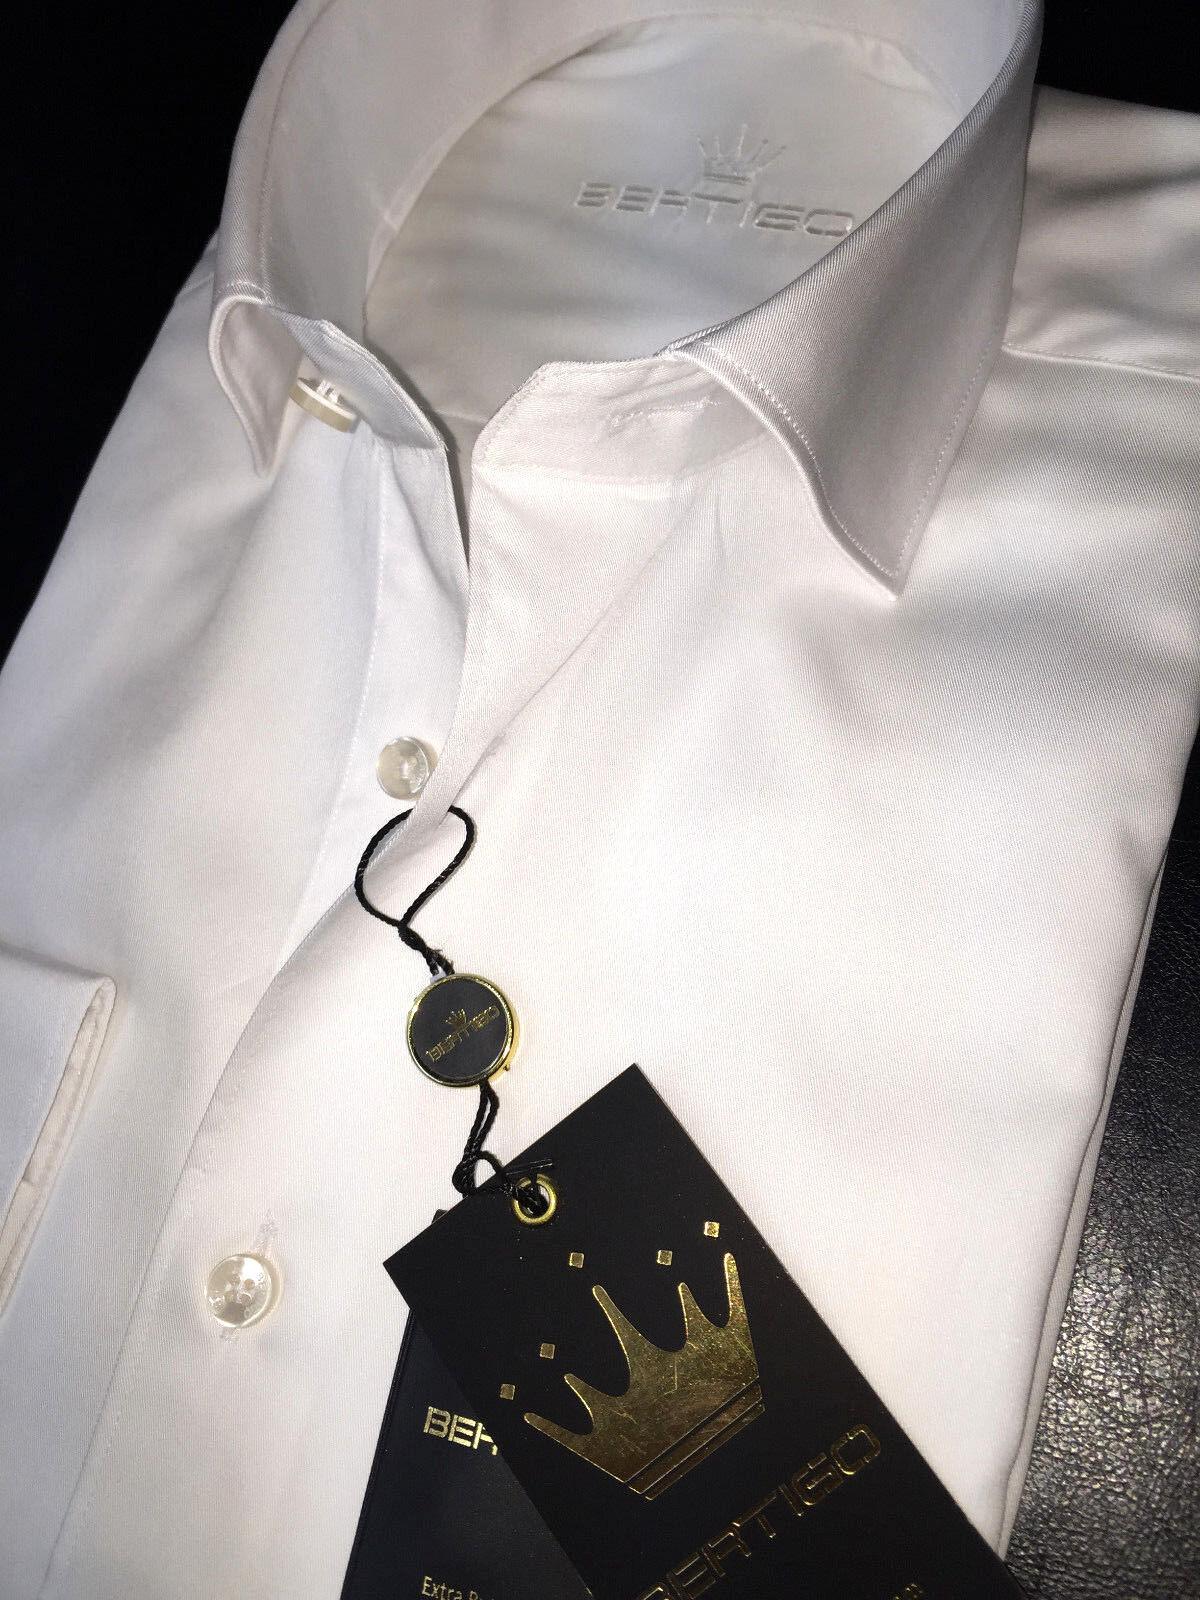 BERTIGO dress shirt OREN-05 Weiß ( schwarz label )